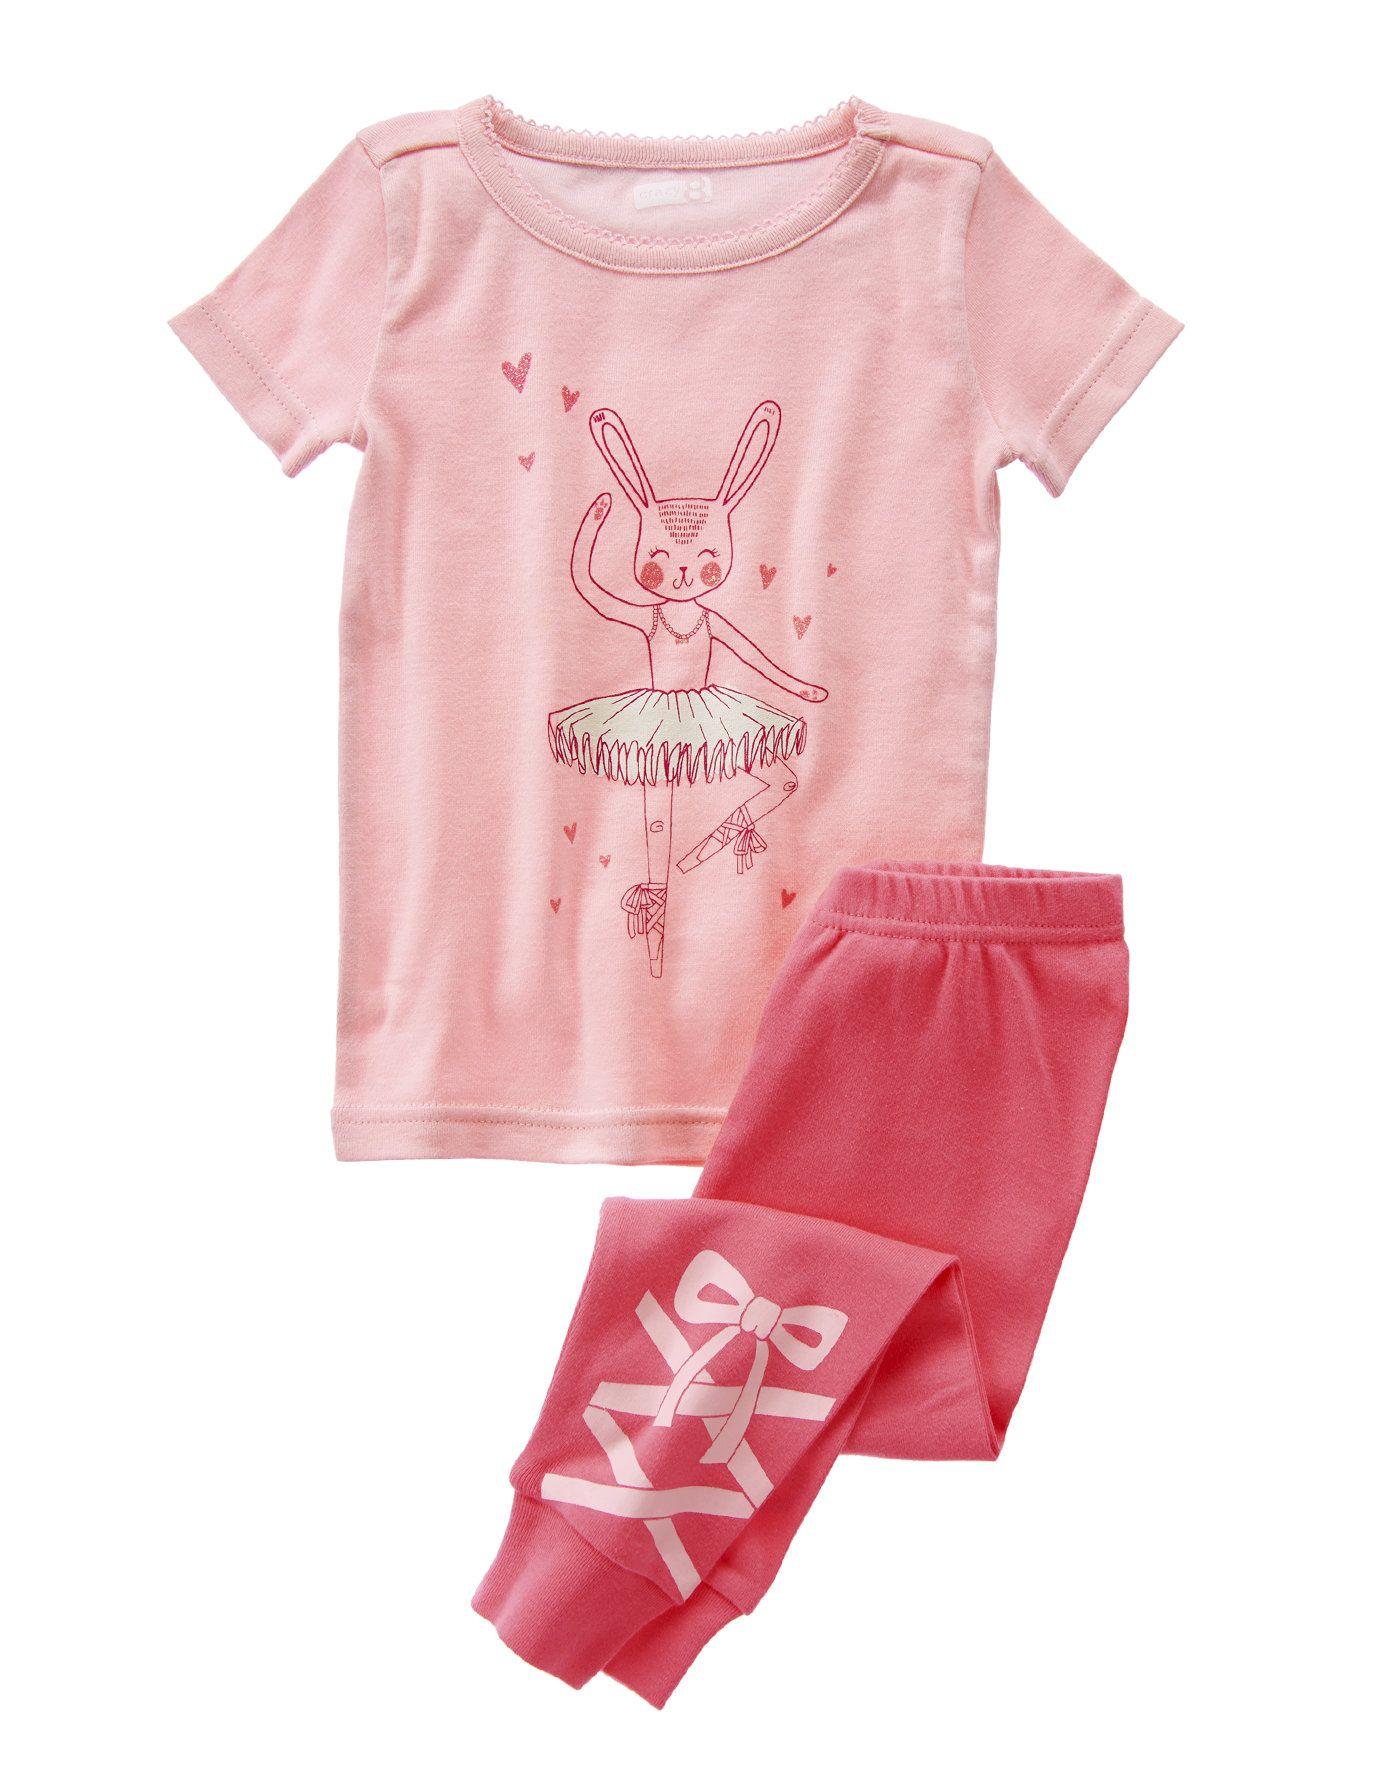 0843b9c68 Ballerina Bunny 2-Piece Pajama Set at Crazy 8 | Ace & Jocelyn's ...